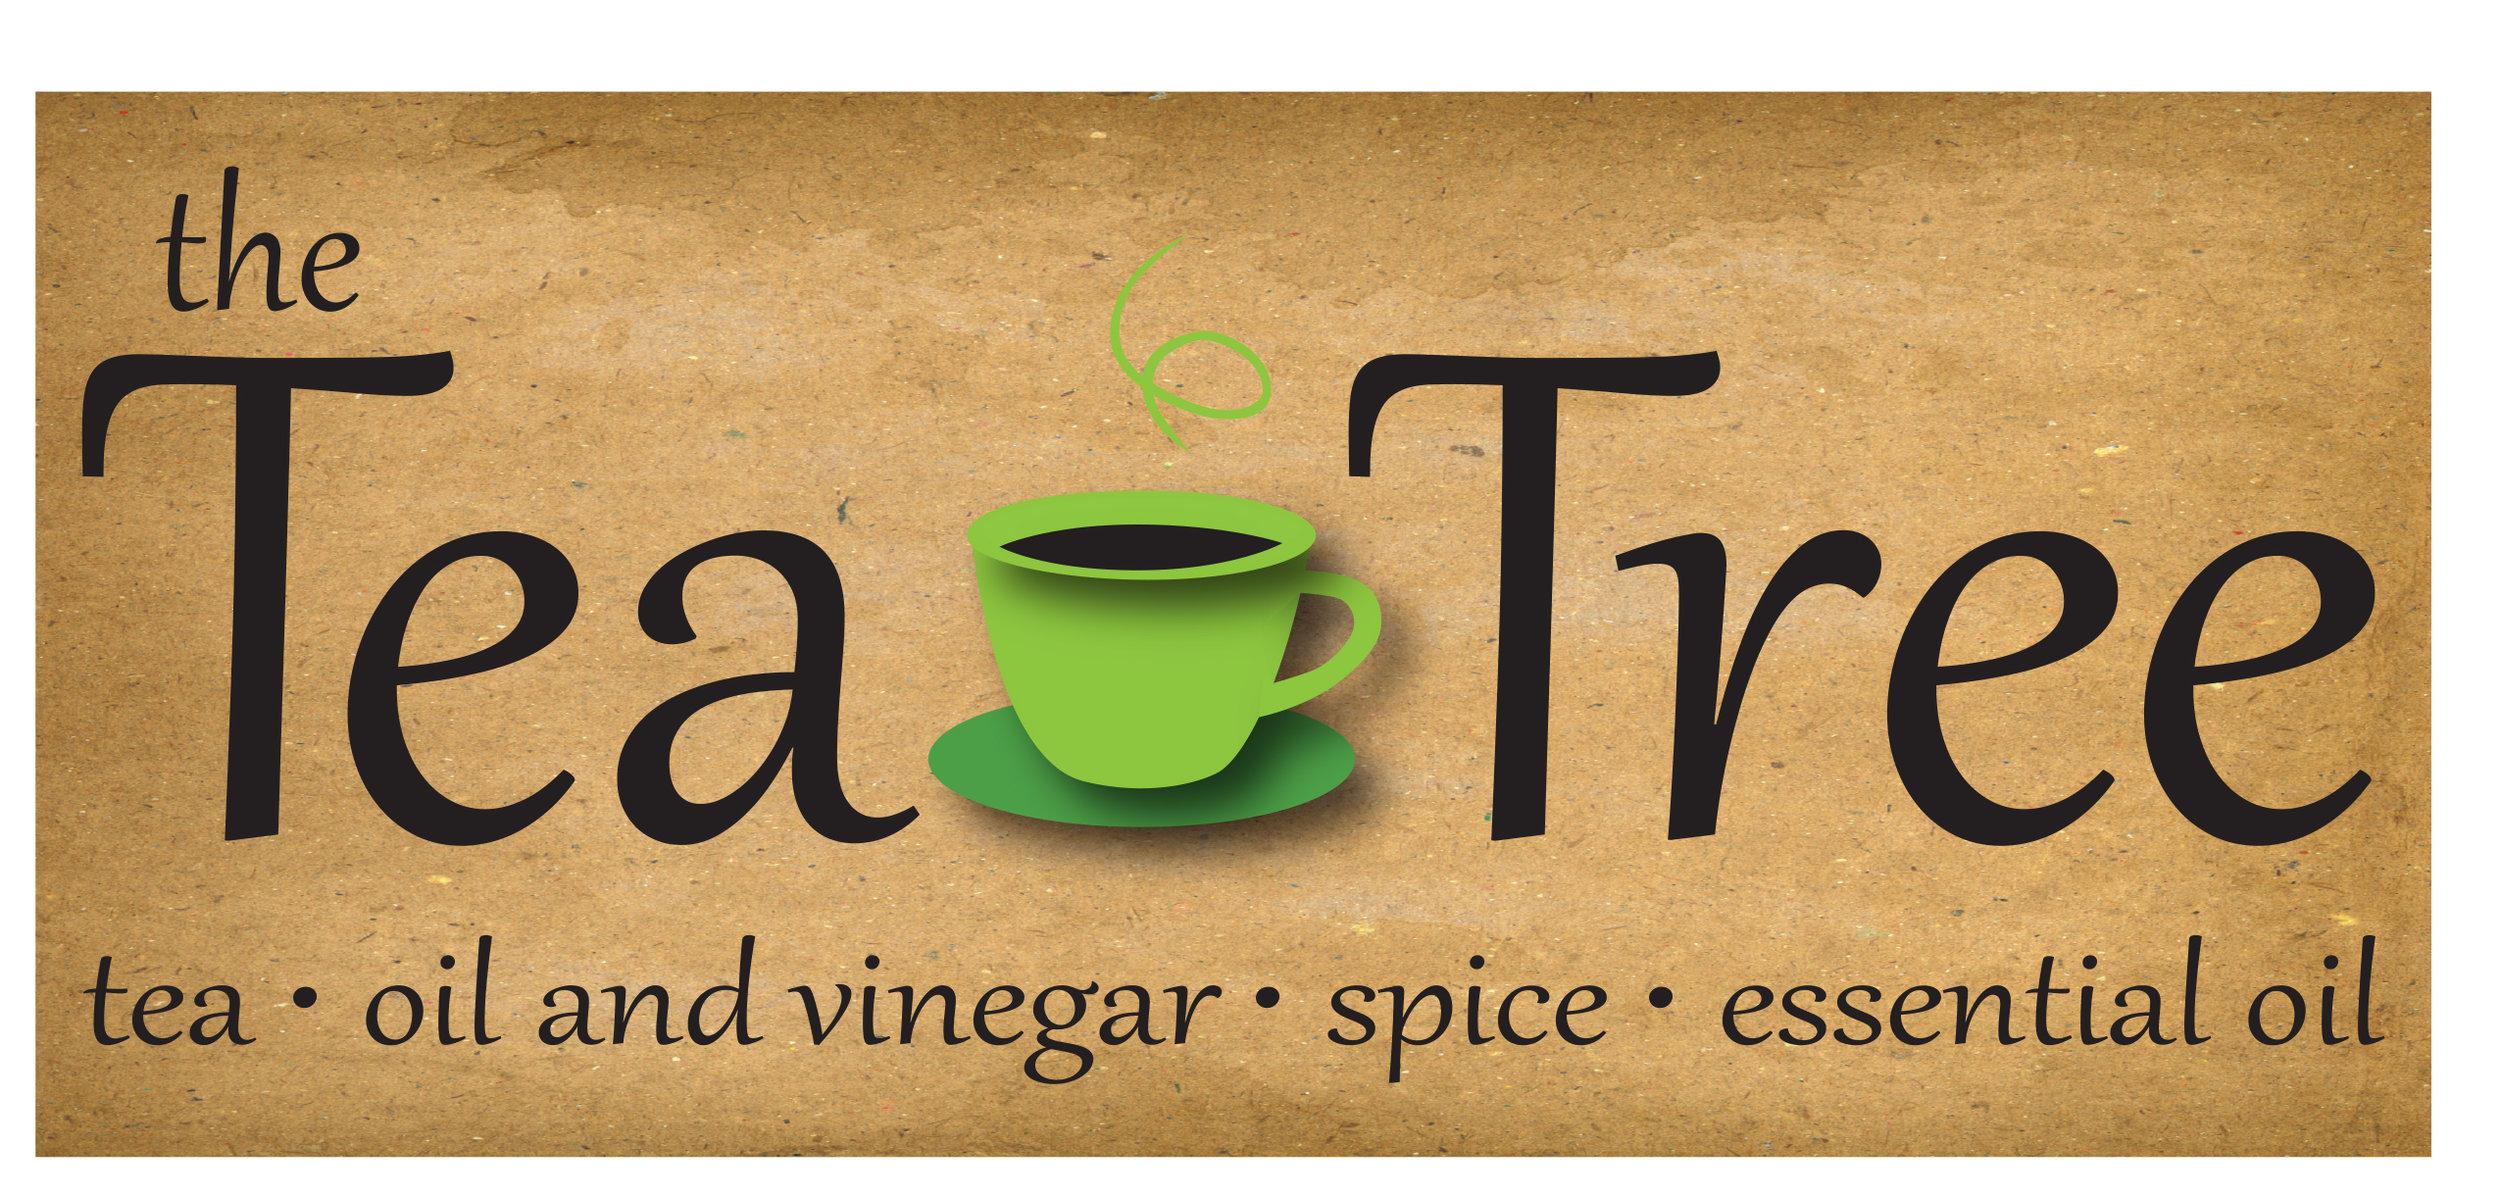 the-tea-tree-batavia-il